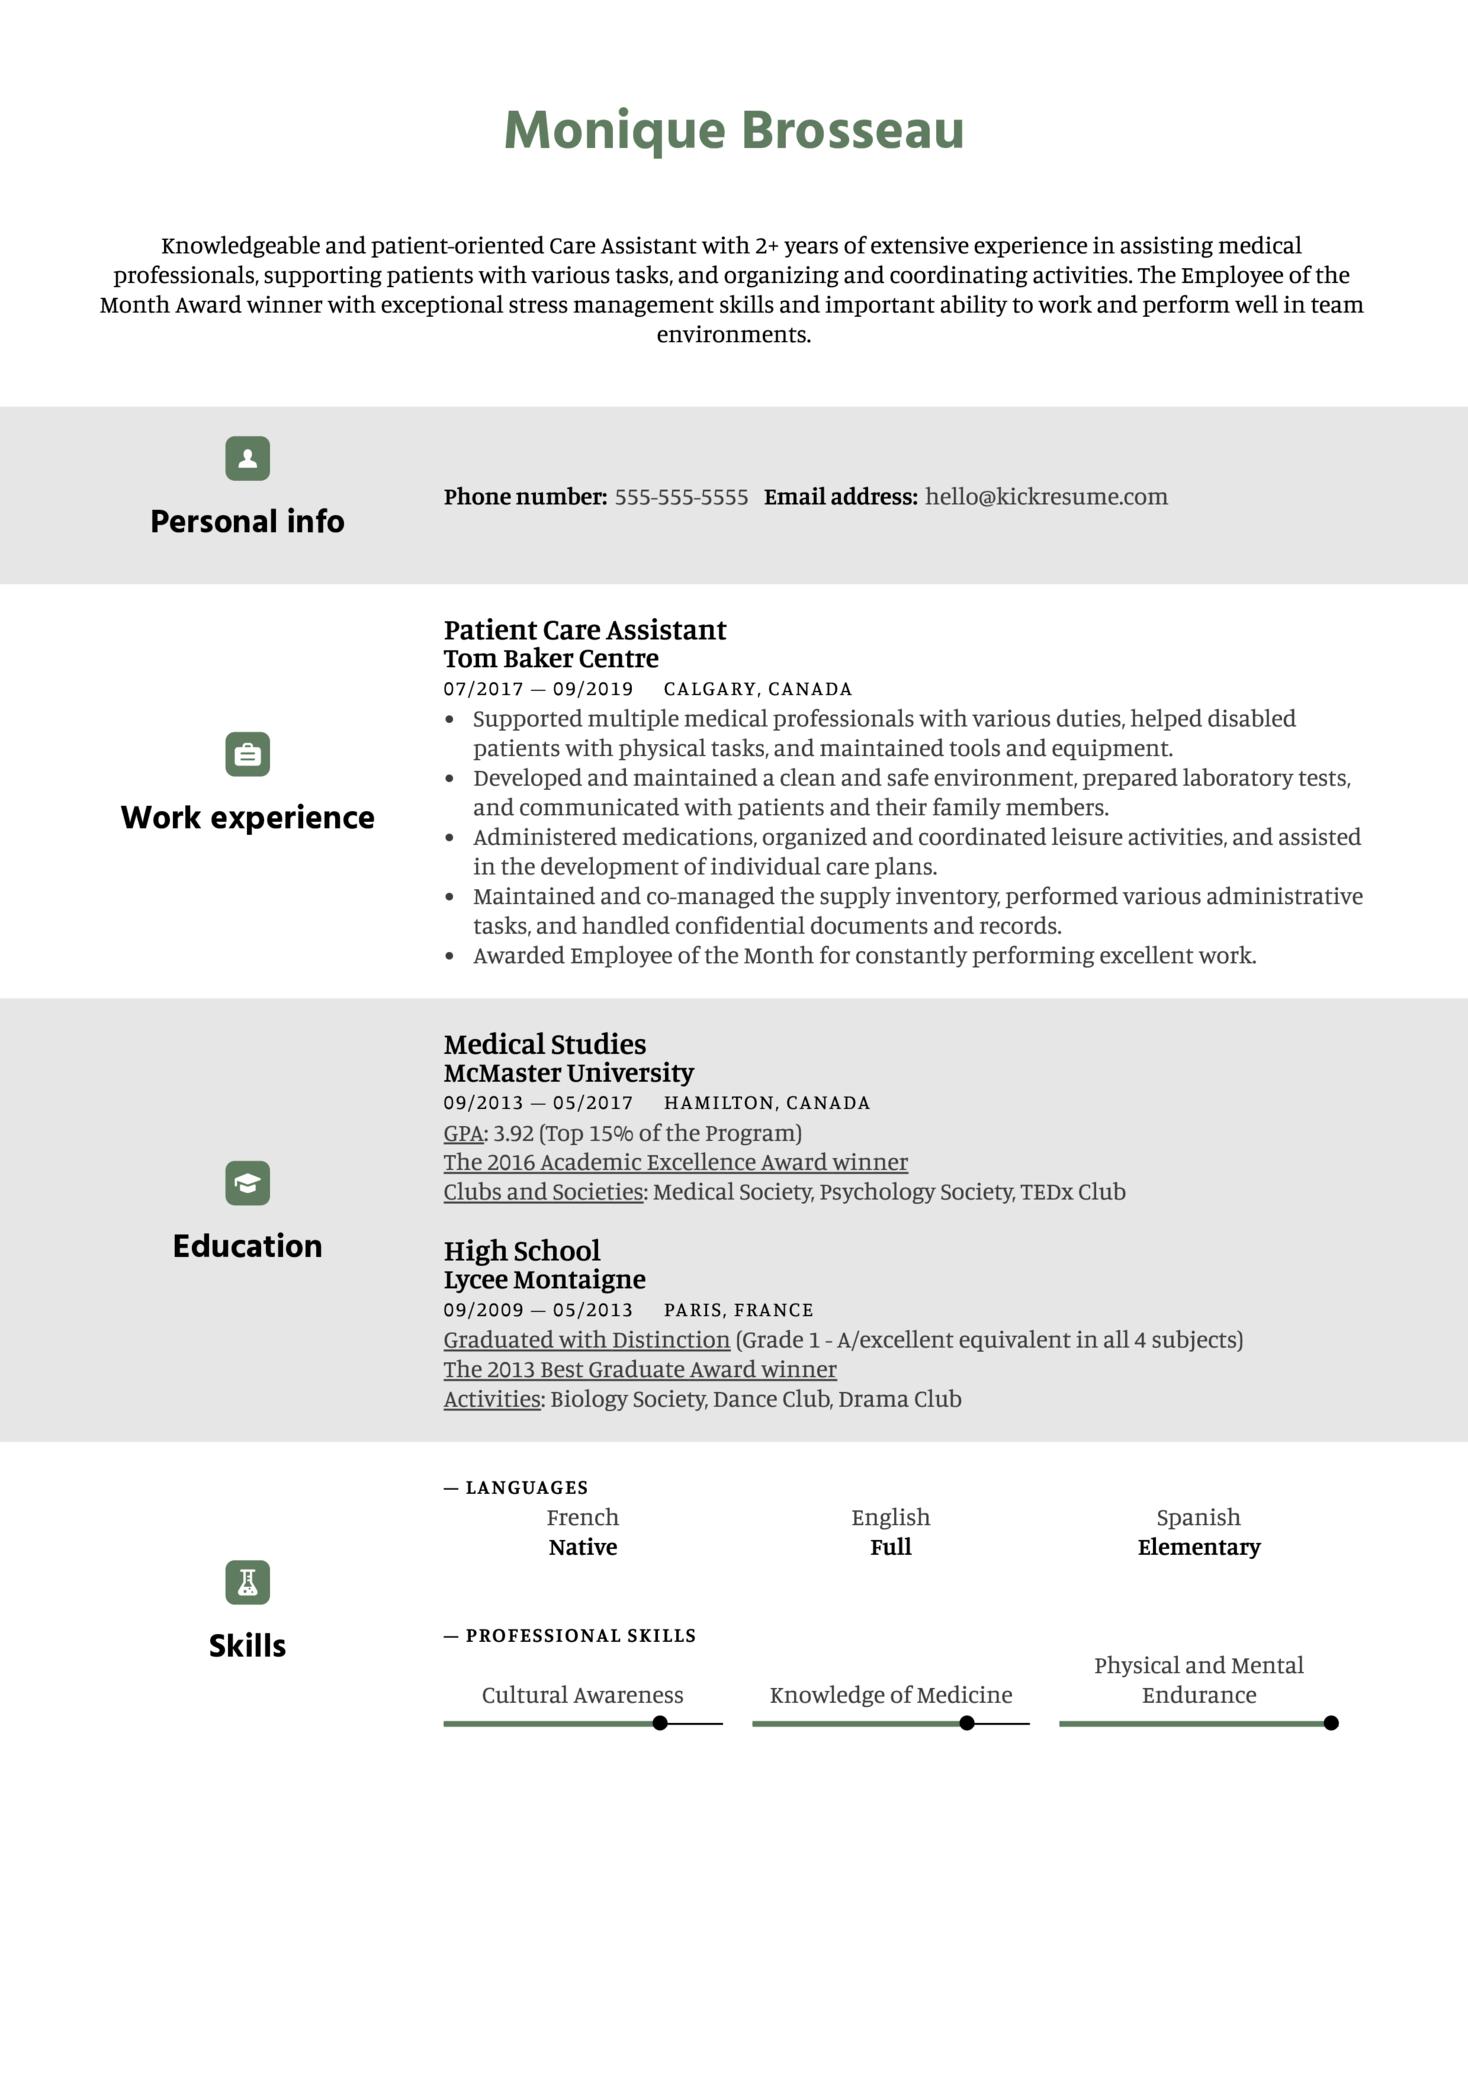 Care Assistant Resume Sample (Teil 1)